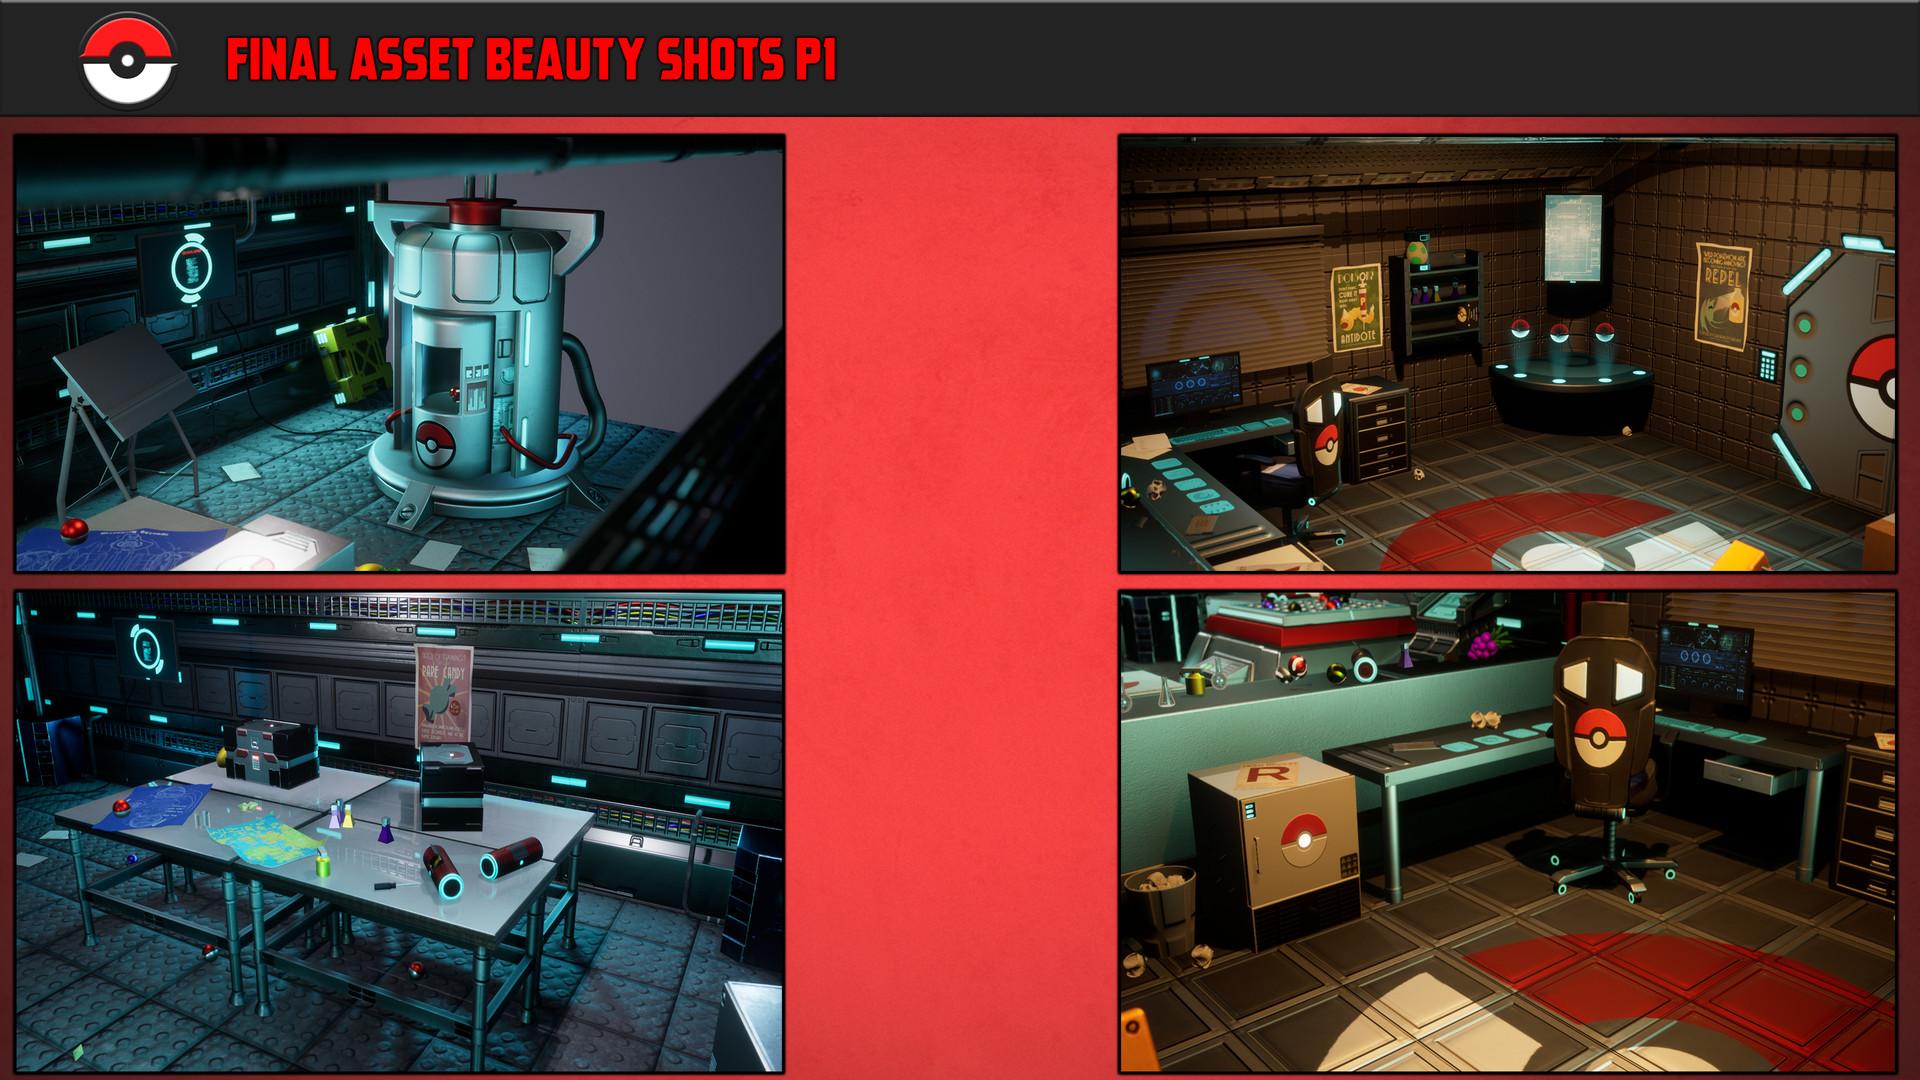 ArtStation - 3D Isometric Sci-fi Pokemon Research Lab (UE4